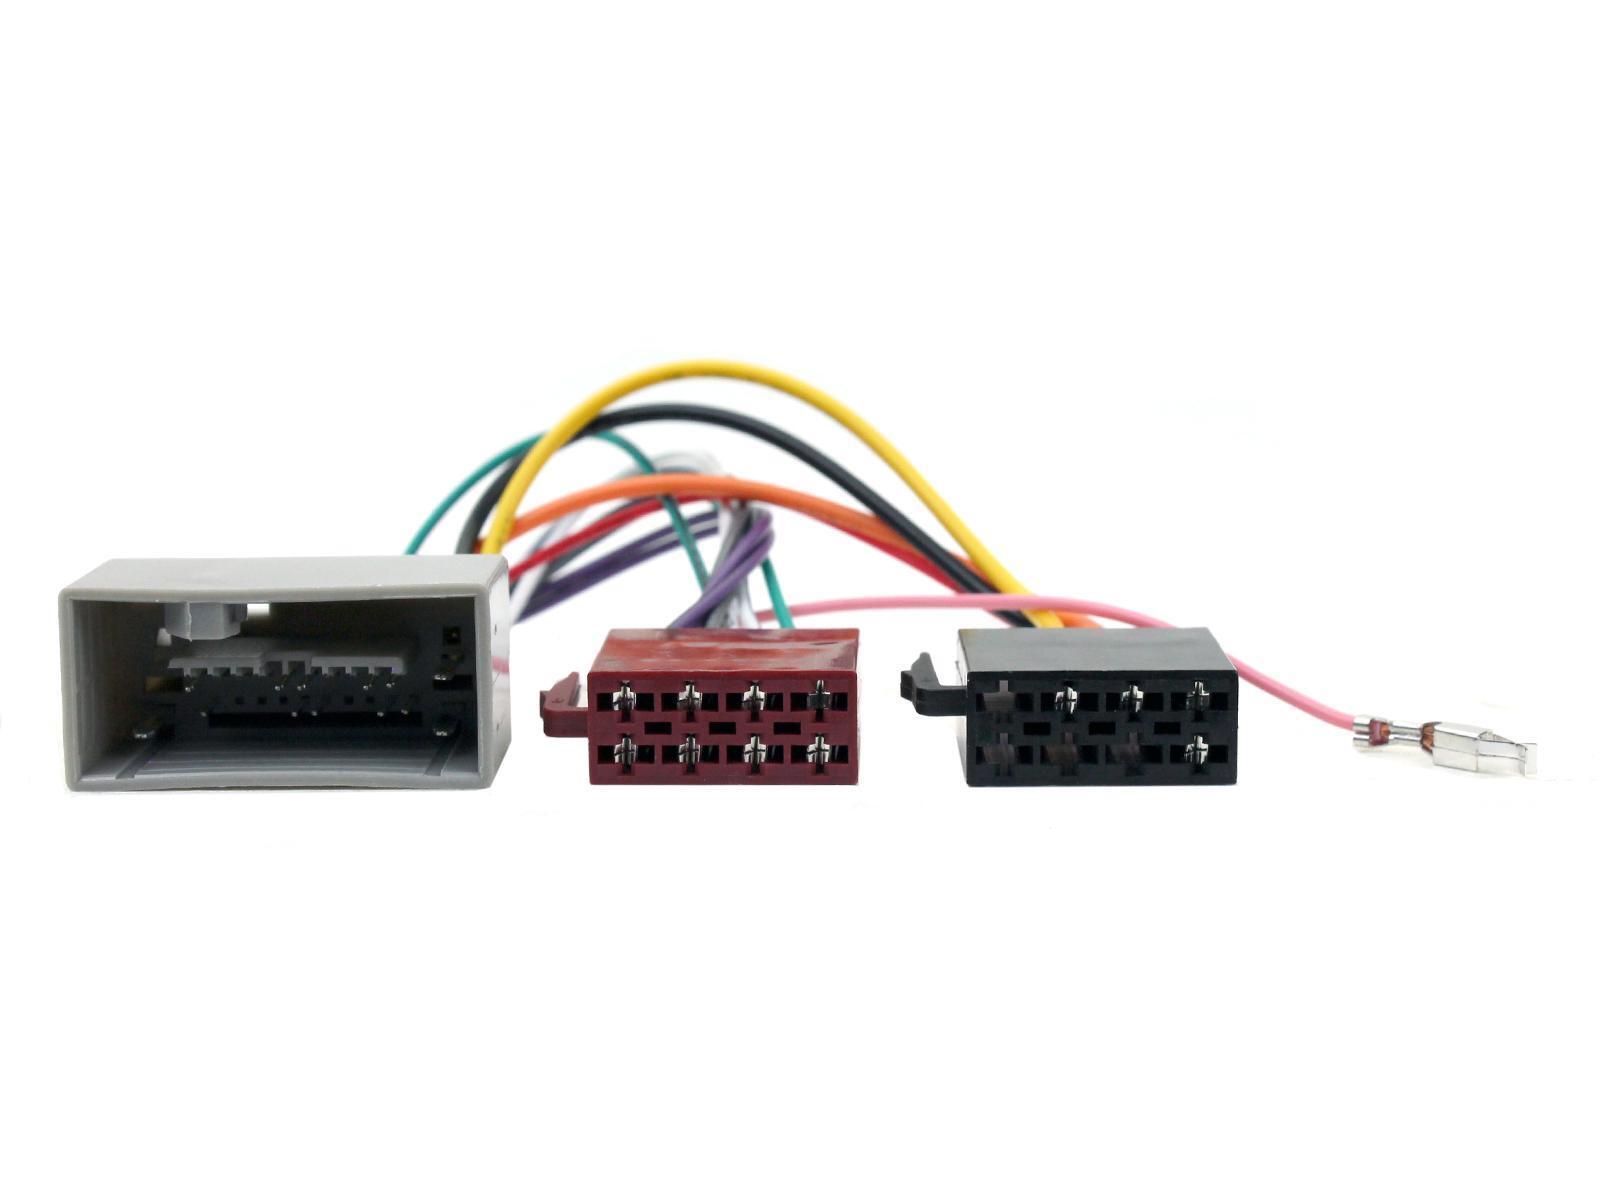 Honda S2000 Stereo Iso Wiring Harness Radio Headunit Adaptor 1600x1200